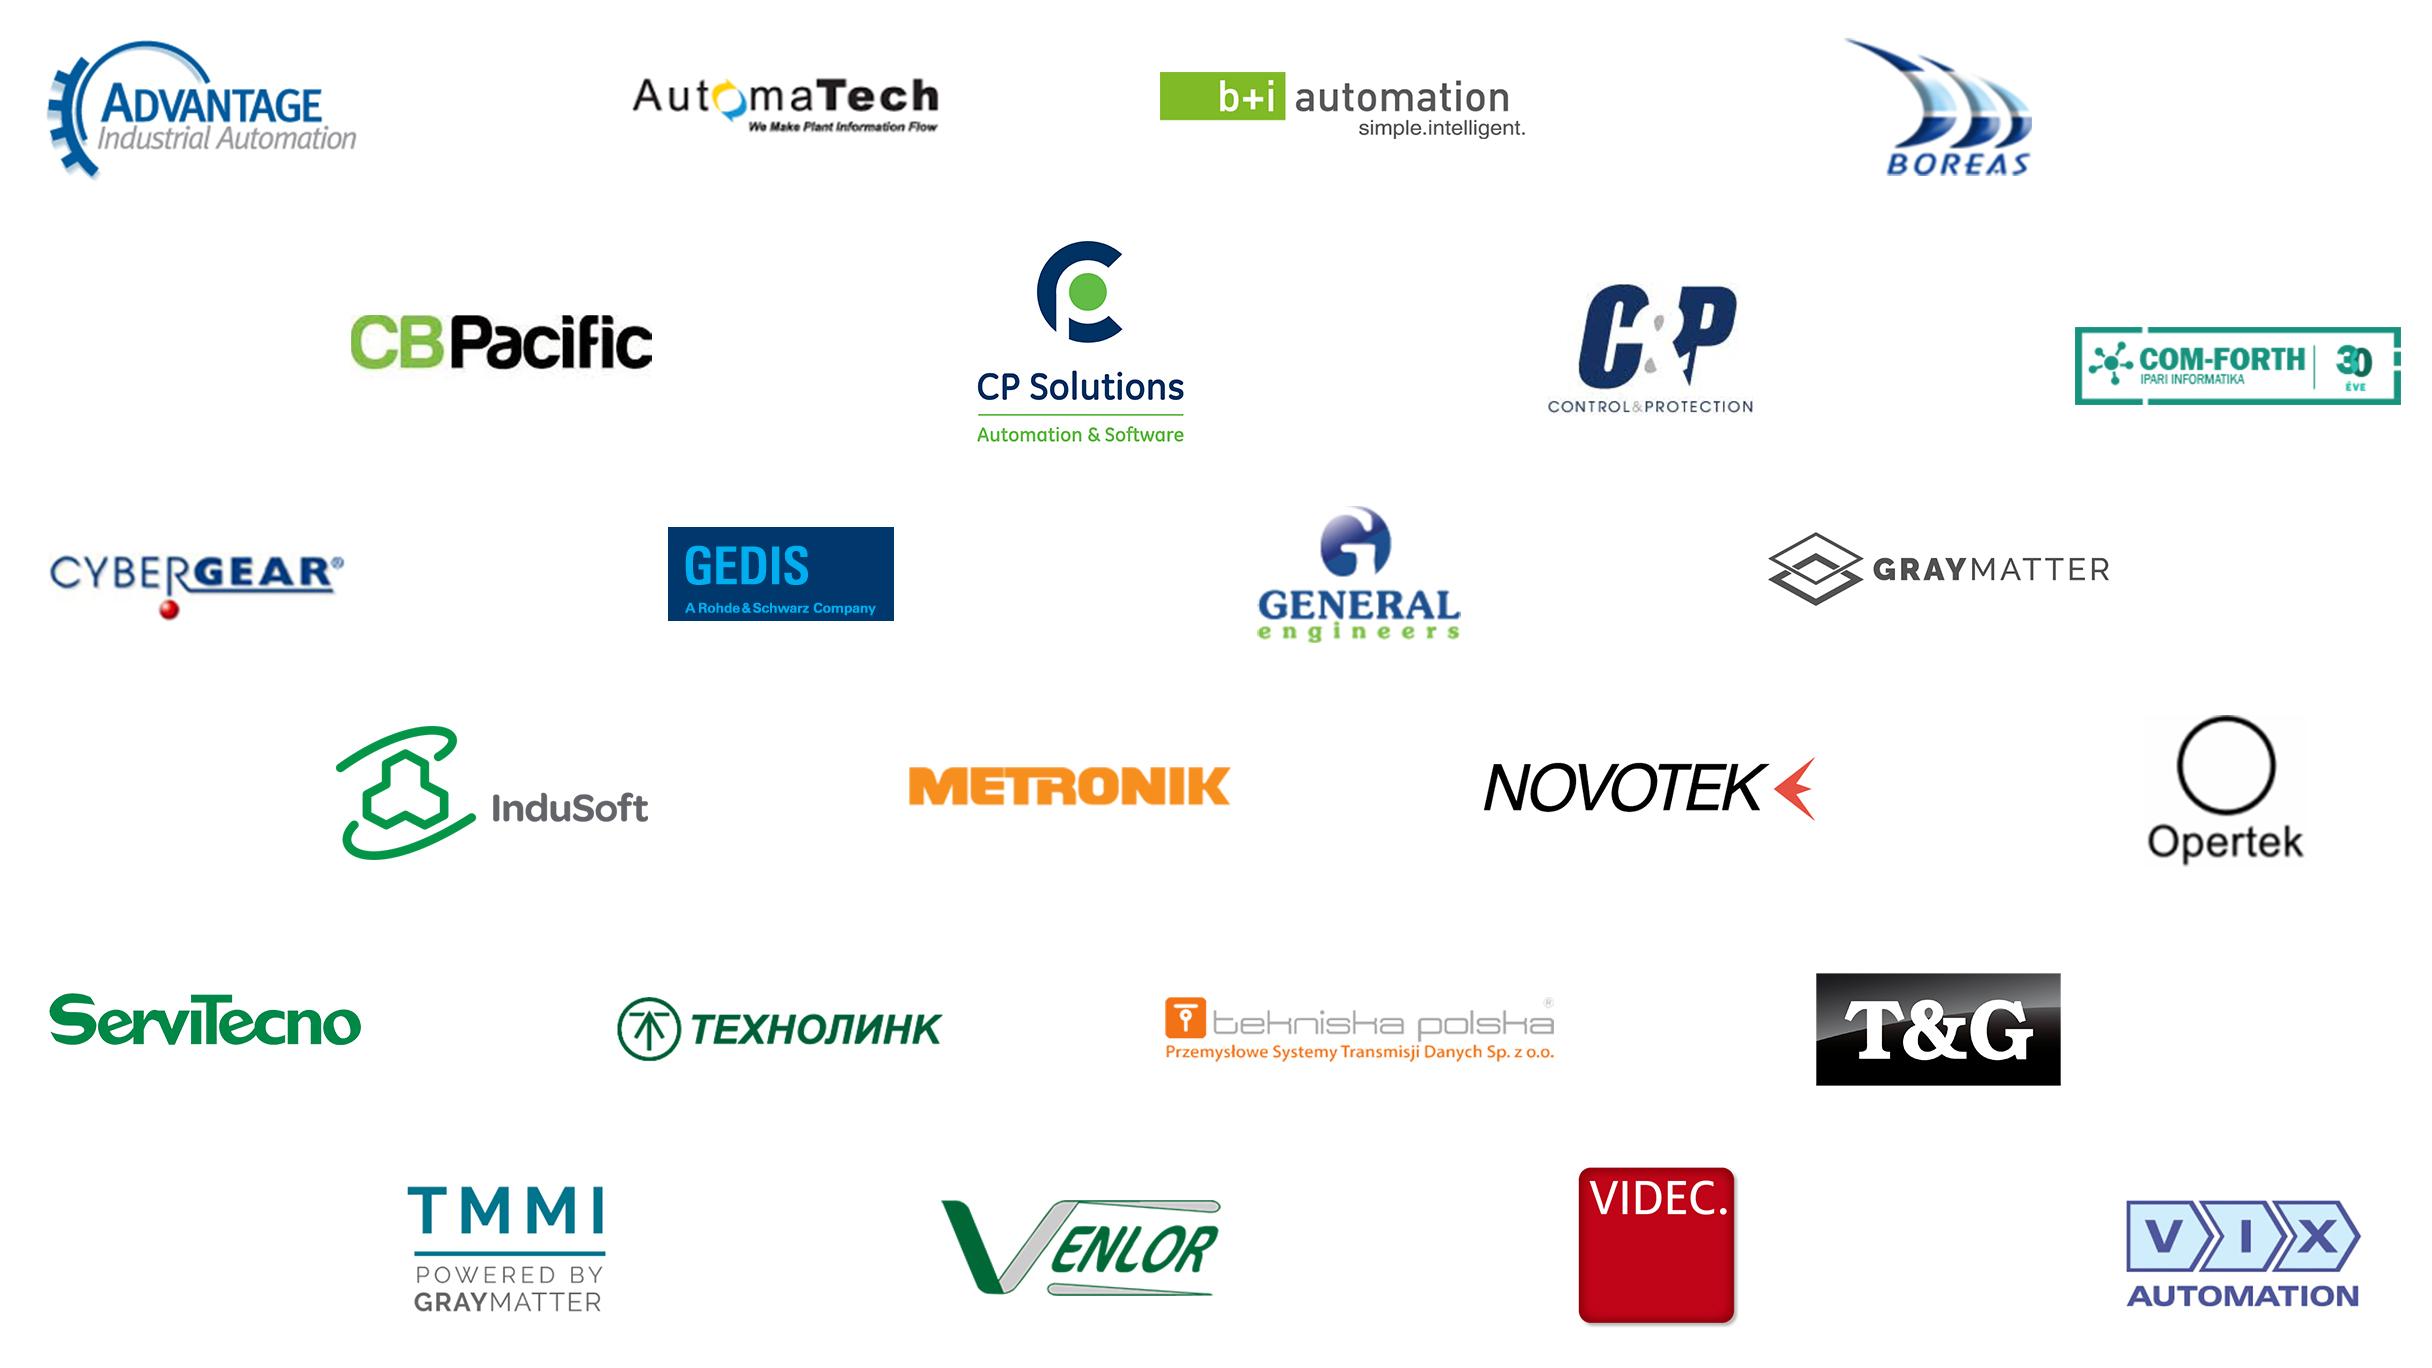 logo-collage-resellers-partners-2432x1368-v3.jpg